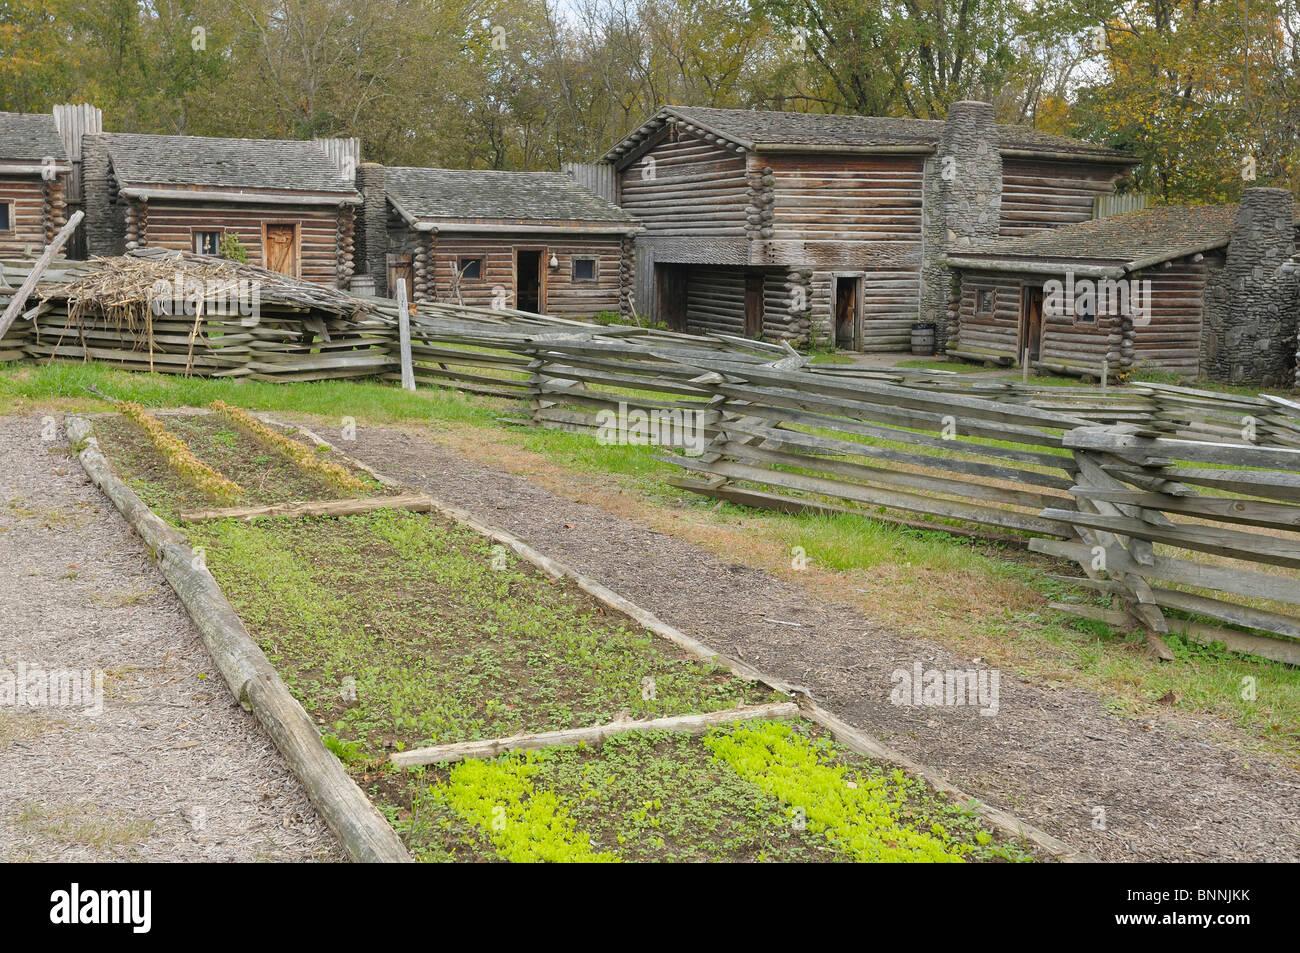 Kitchen Garden Fence Fort Boonesboroughugh State Park Boonesborough Kentucky Usa